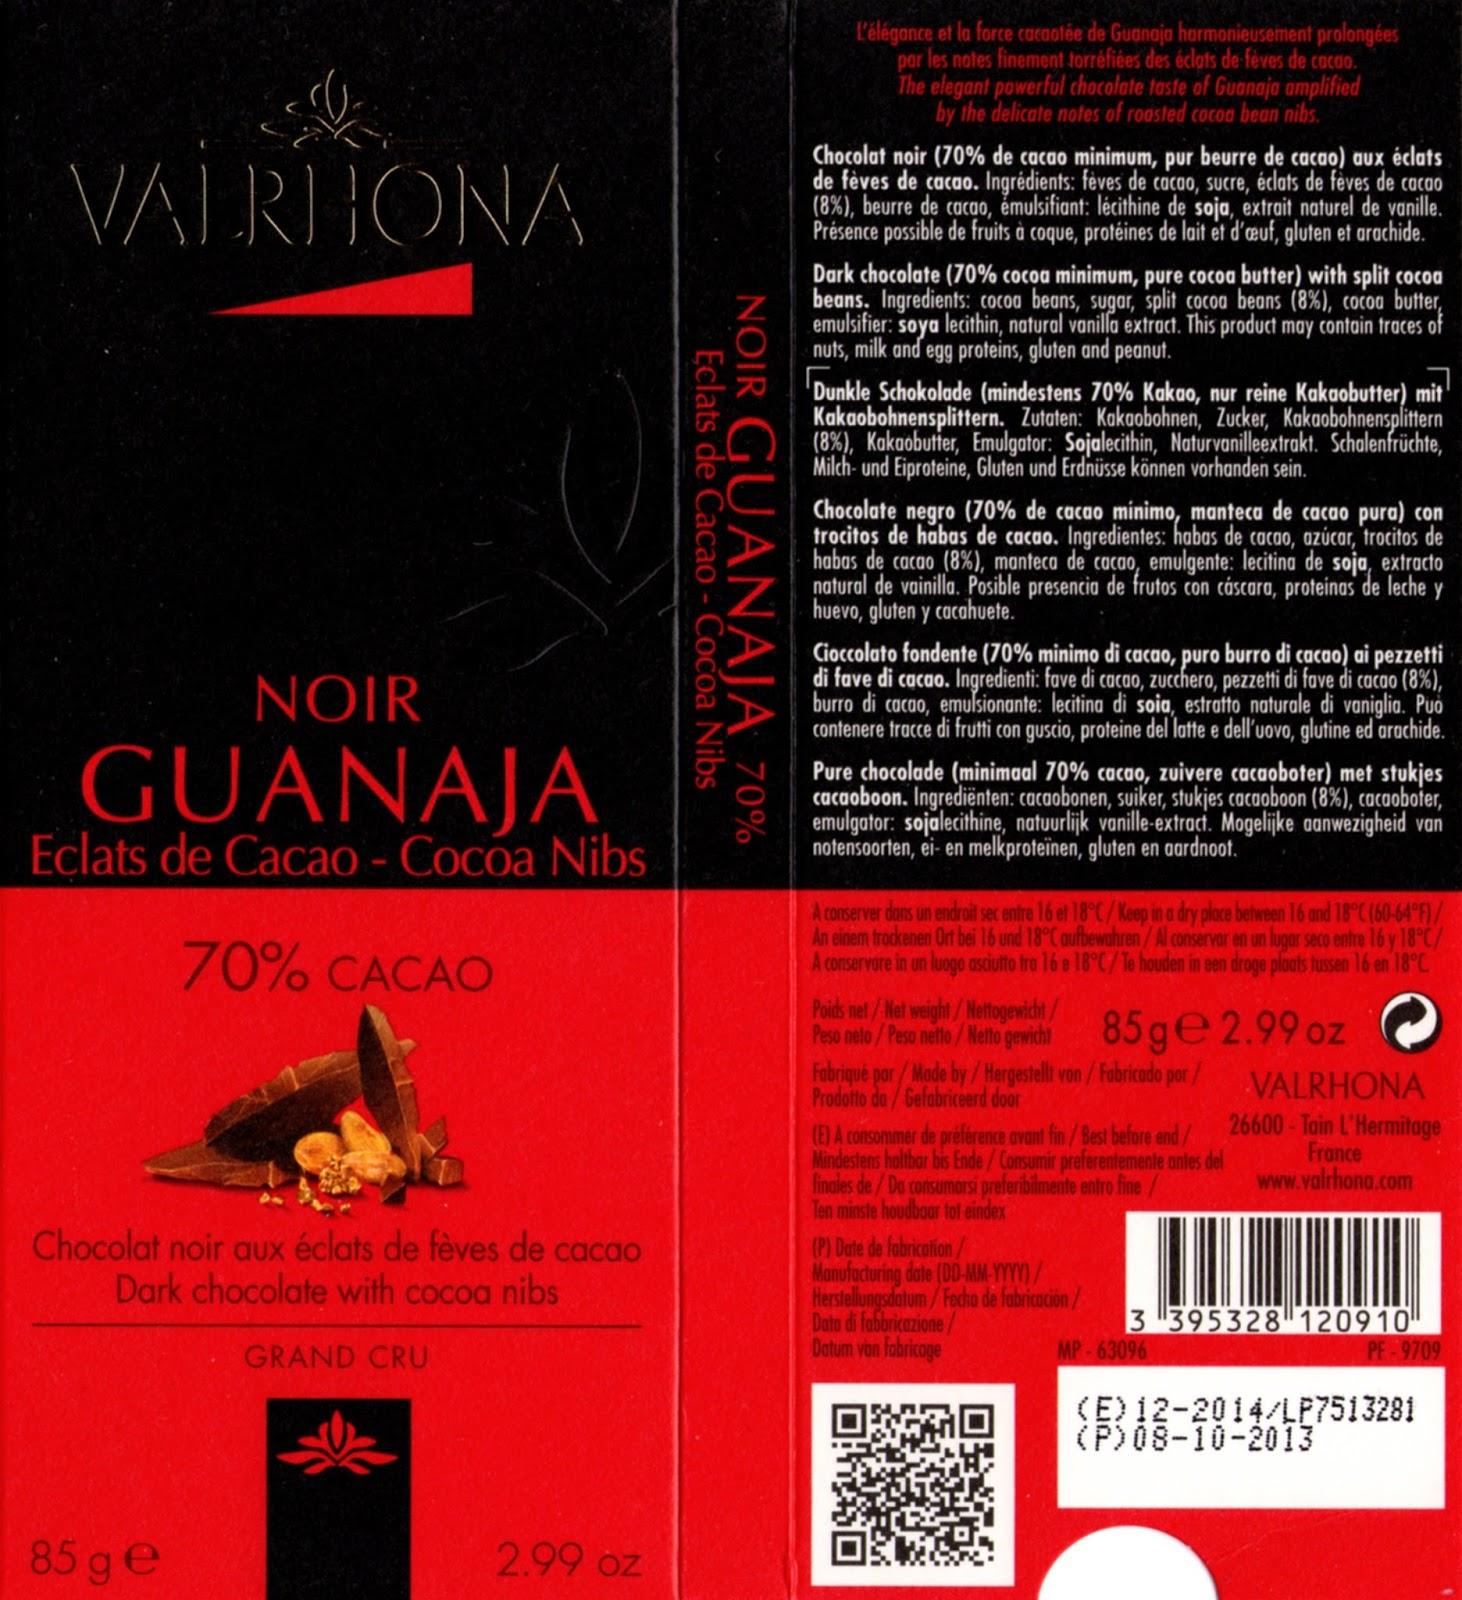 tablette de chocolat noir gourmand valrhona noir guanaja eclats de cacao 70